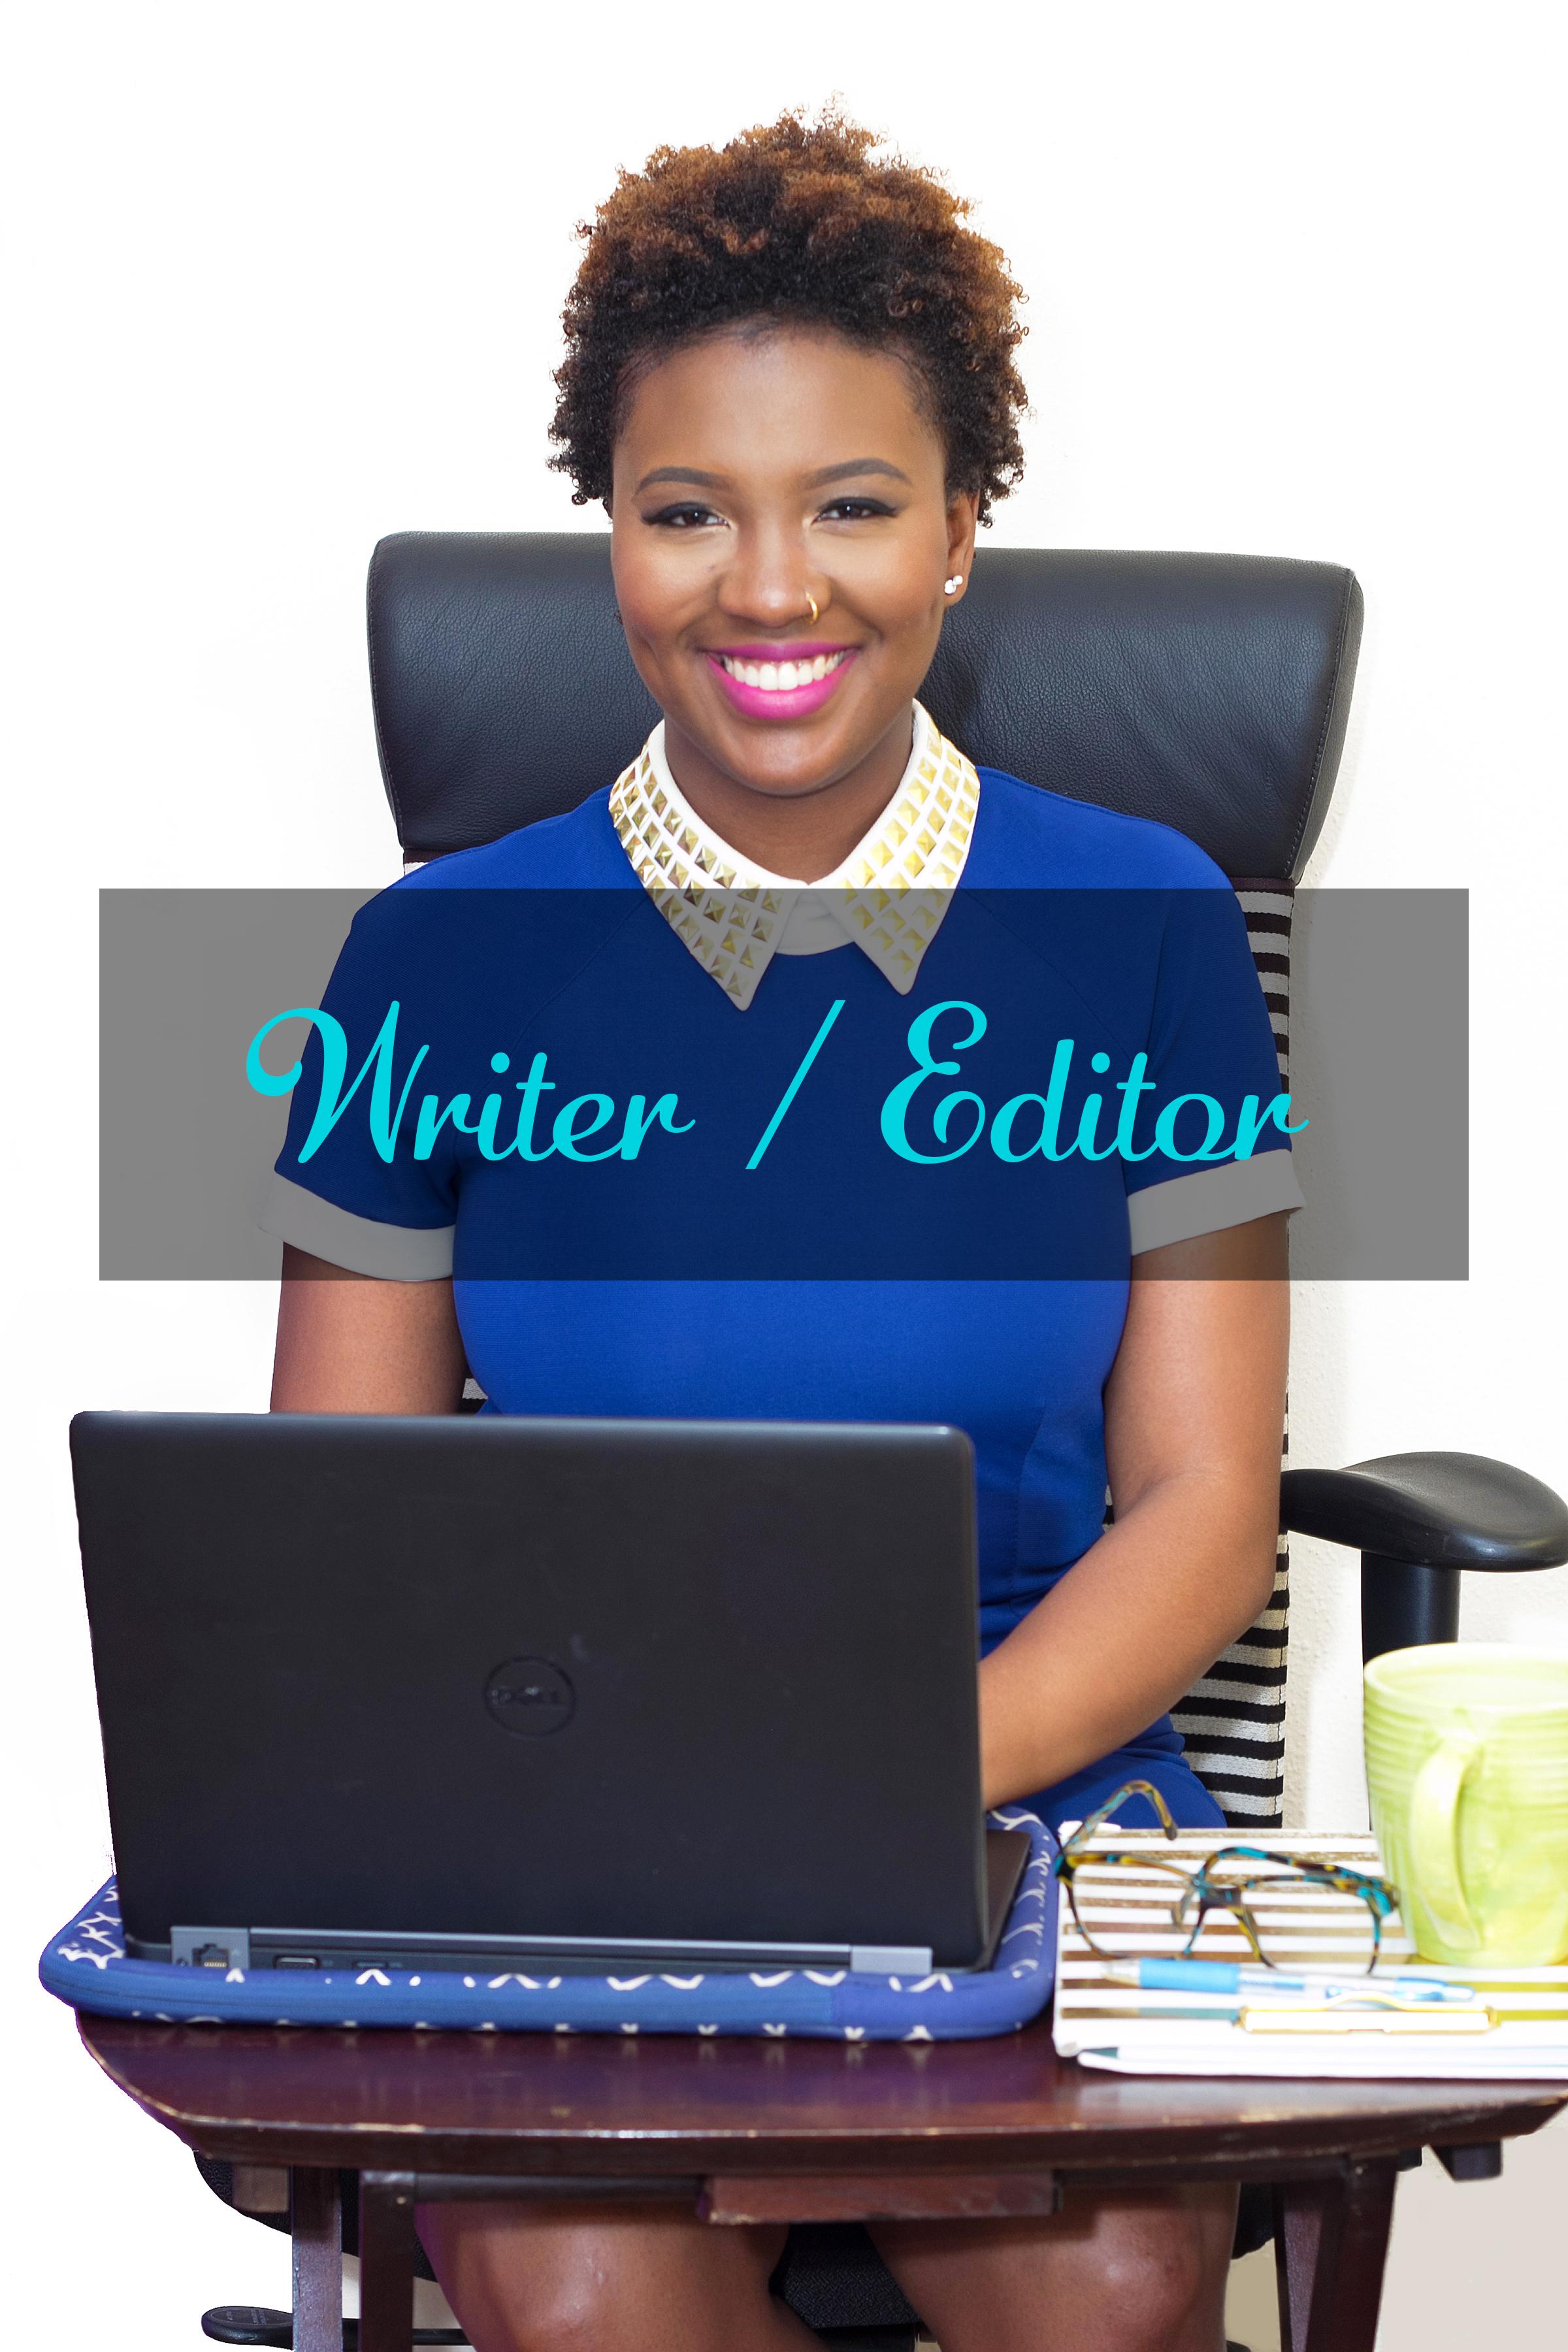 wRITER/ EDITOR